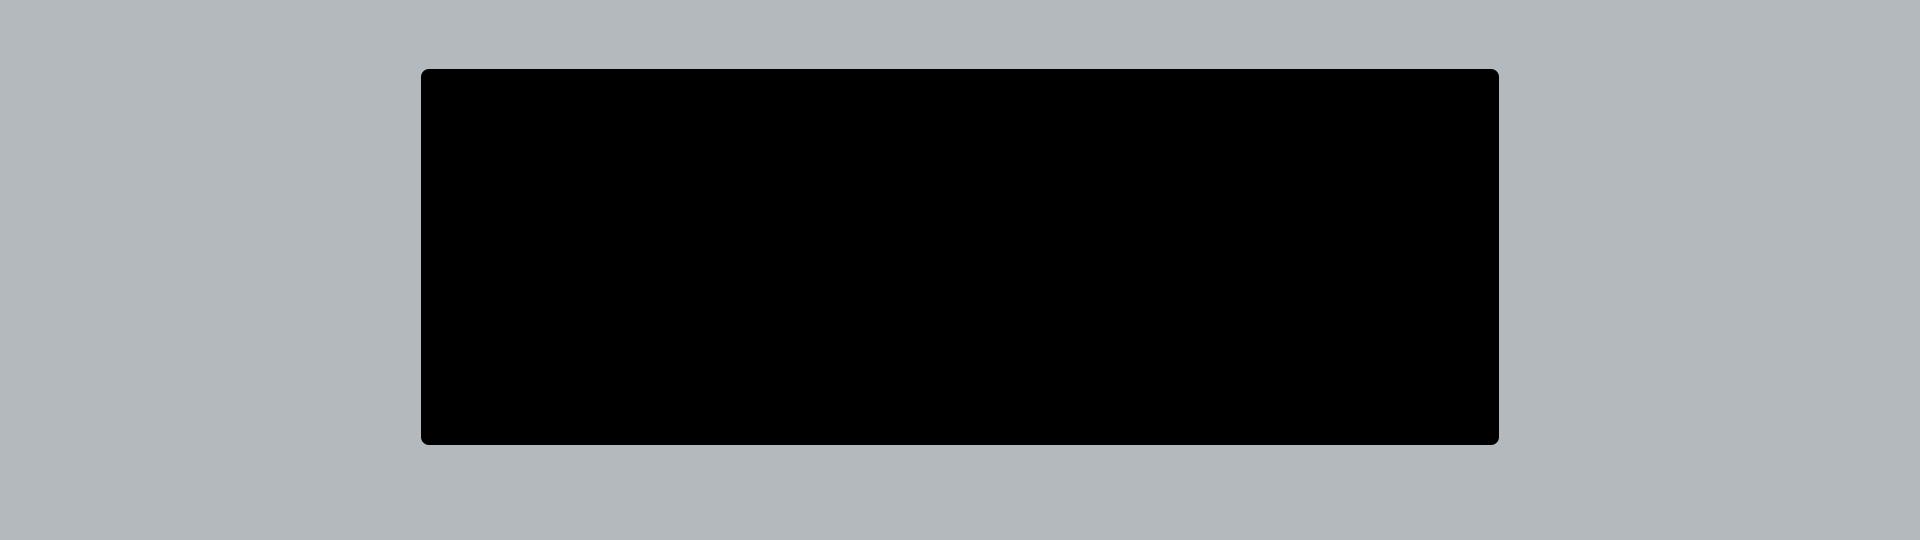 CATEGORY-TEMTUK-2URUNE50INDRM-11-07